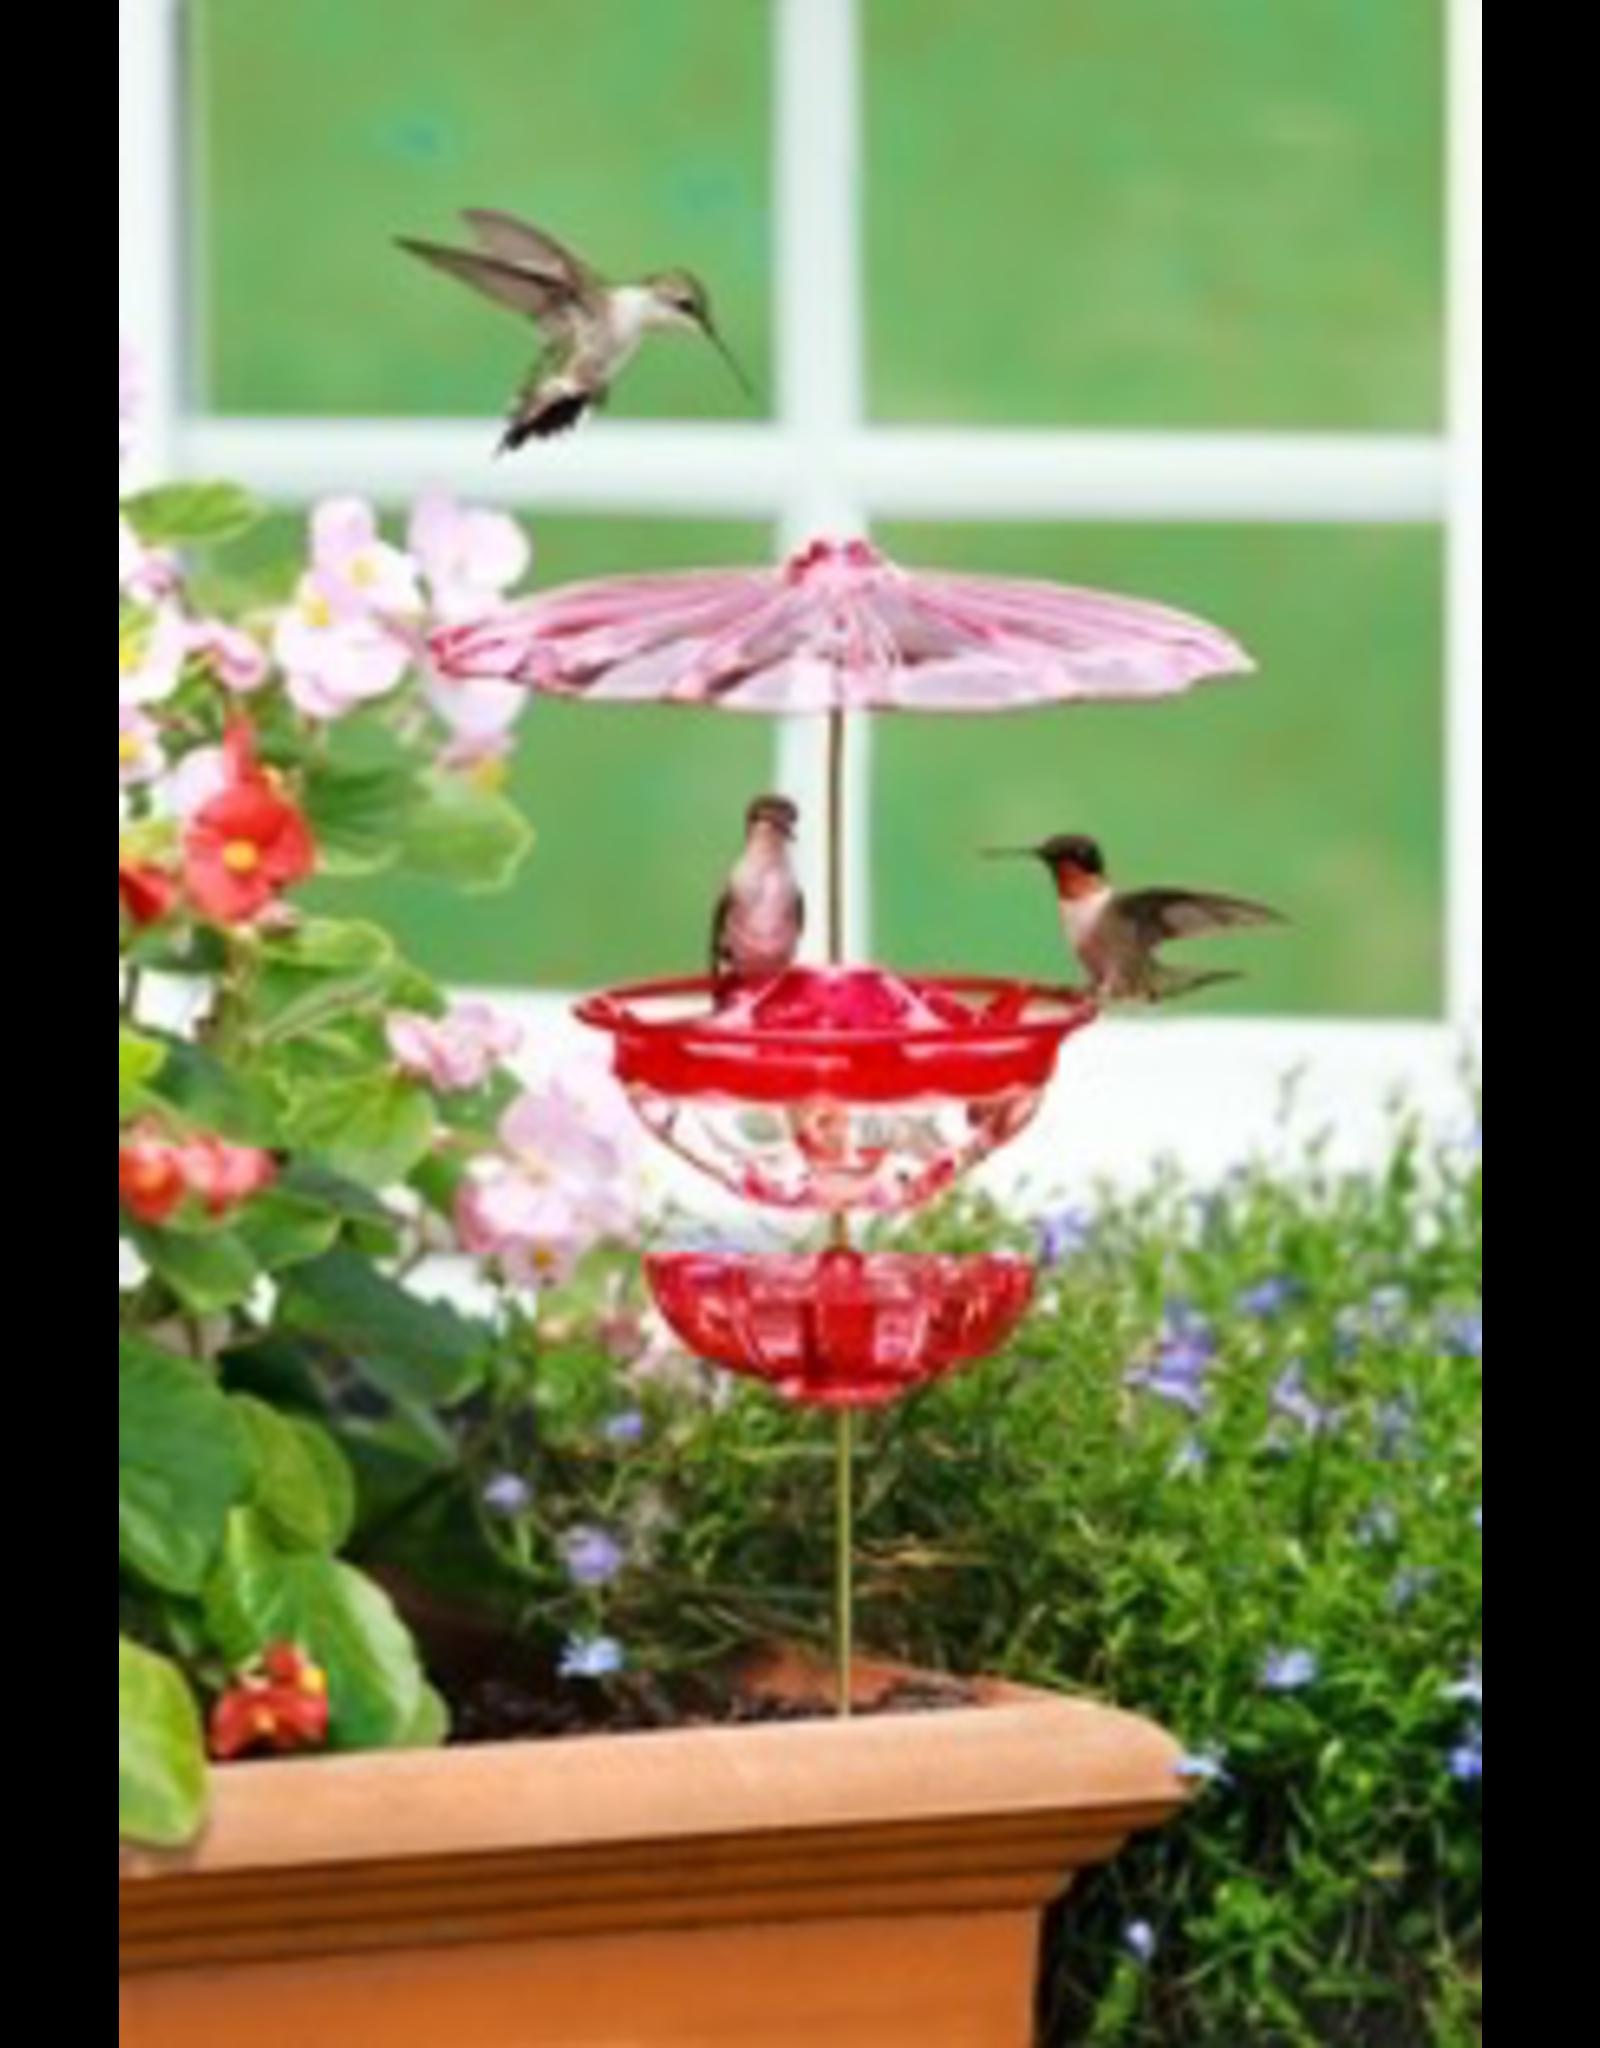 Aspects ASP436 Hummingbird feeder accessory kit